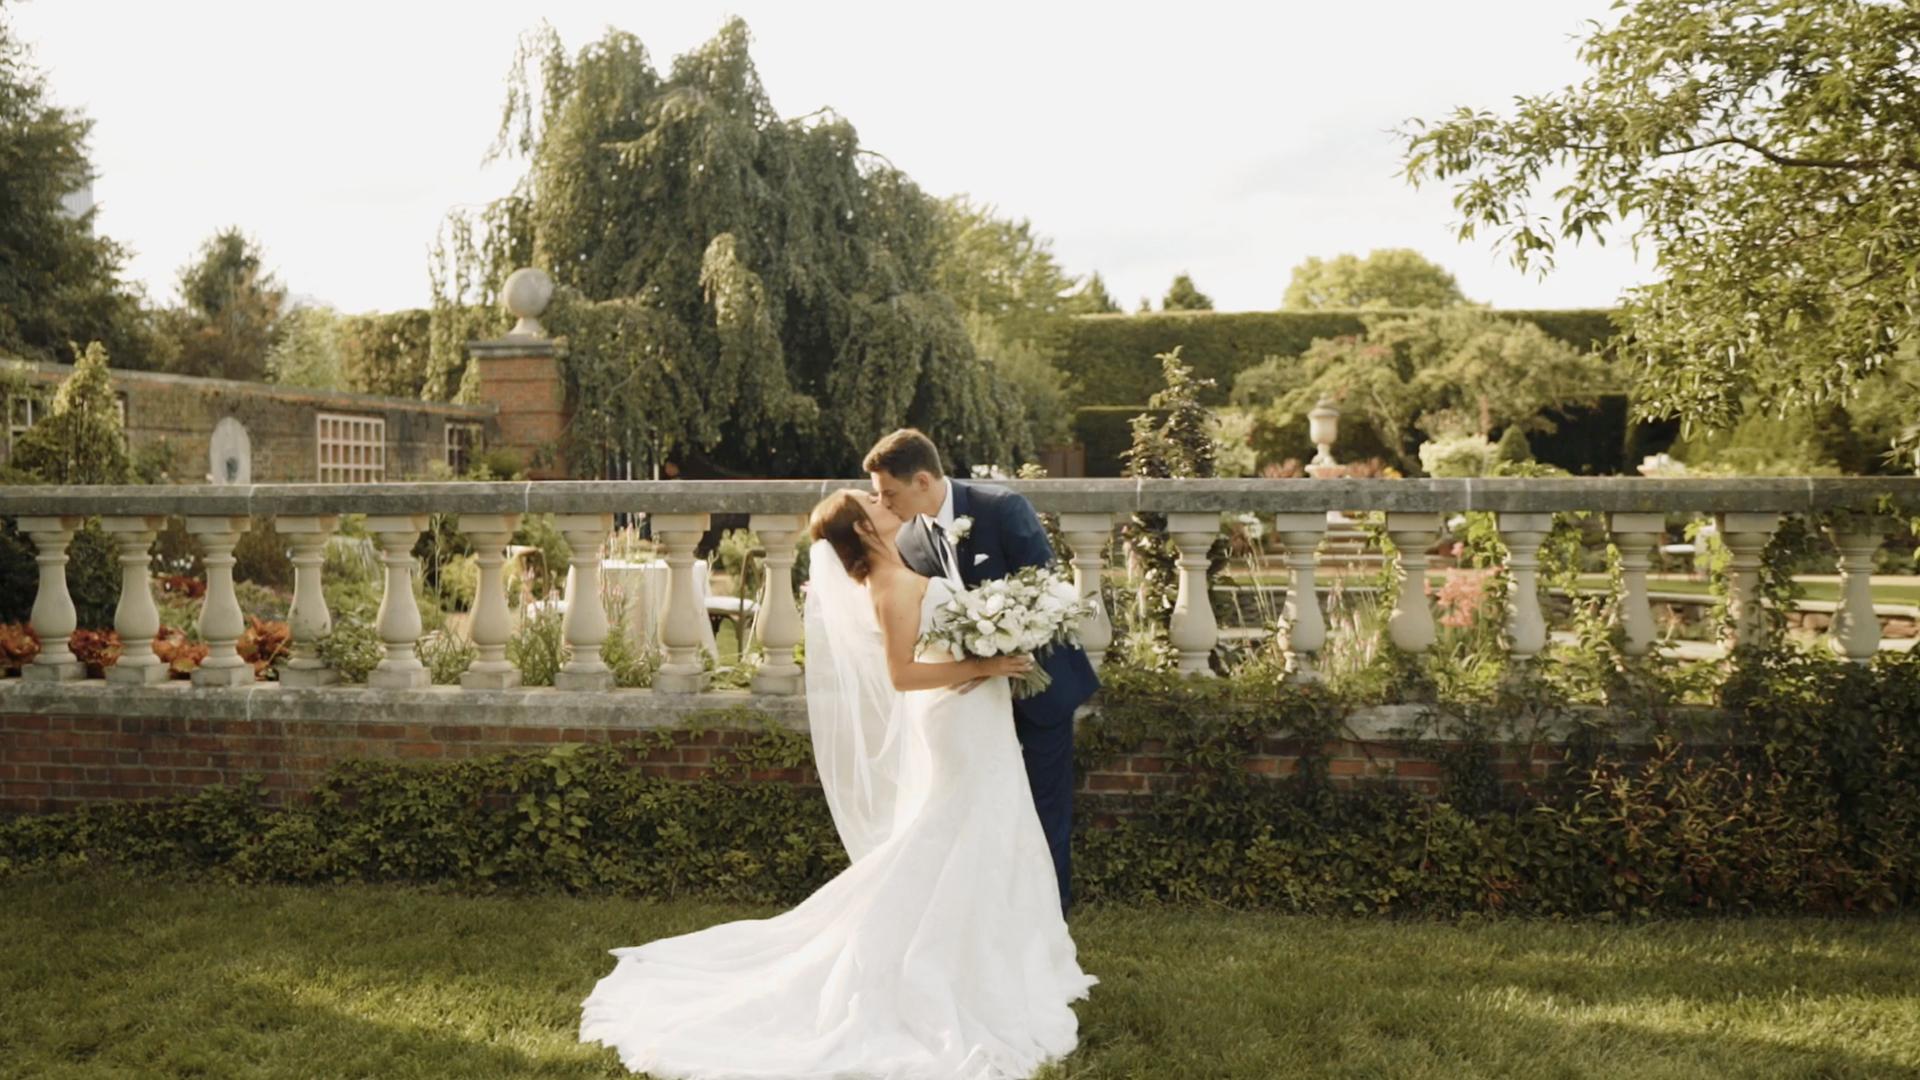 Alison + Jared | Chicago, Illinois | Chicago Botanic Garden